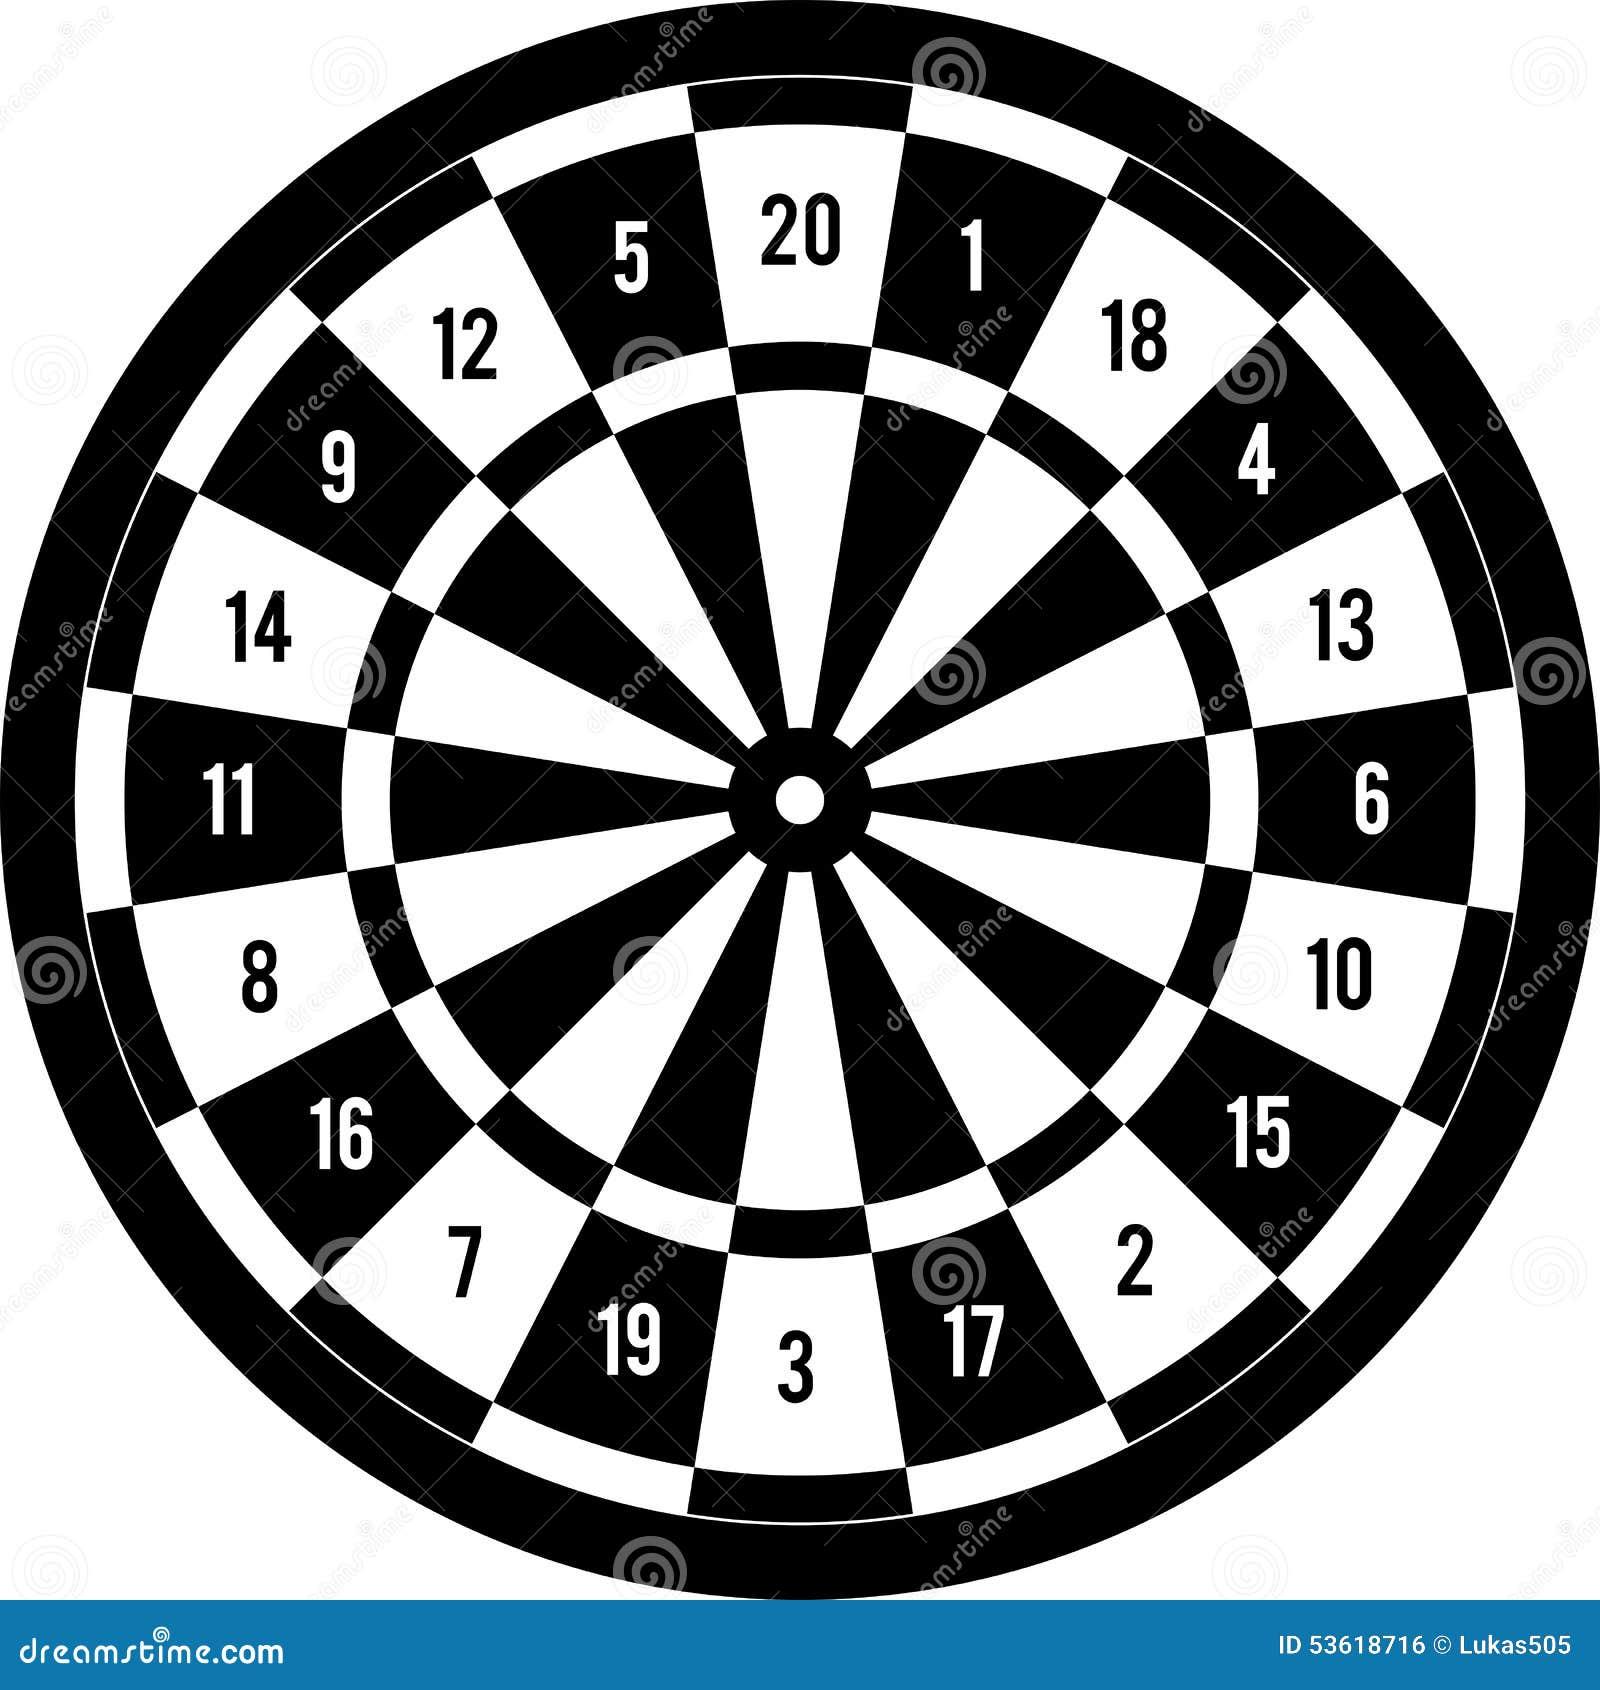 Darts Target Black & White Stock Vector - Image: 53618716